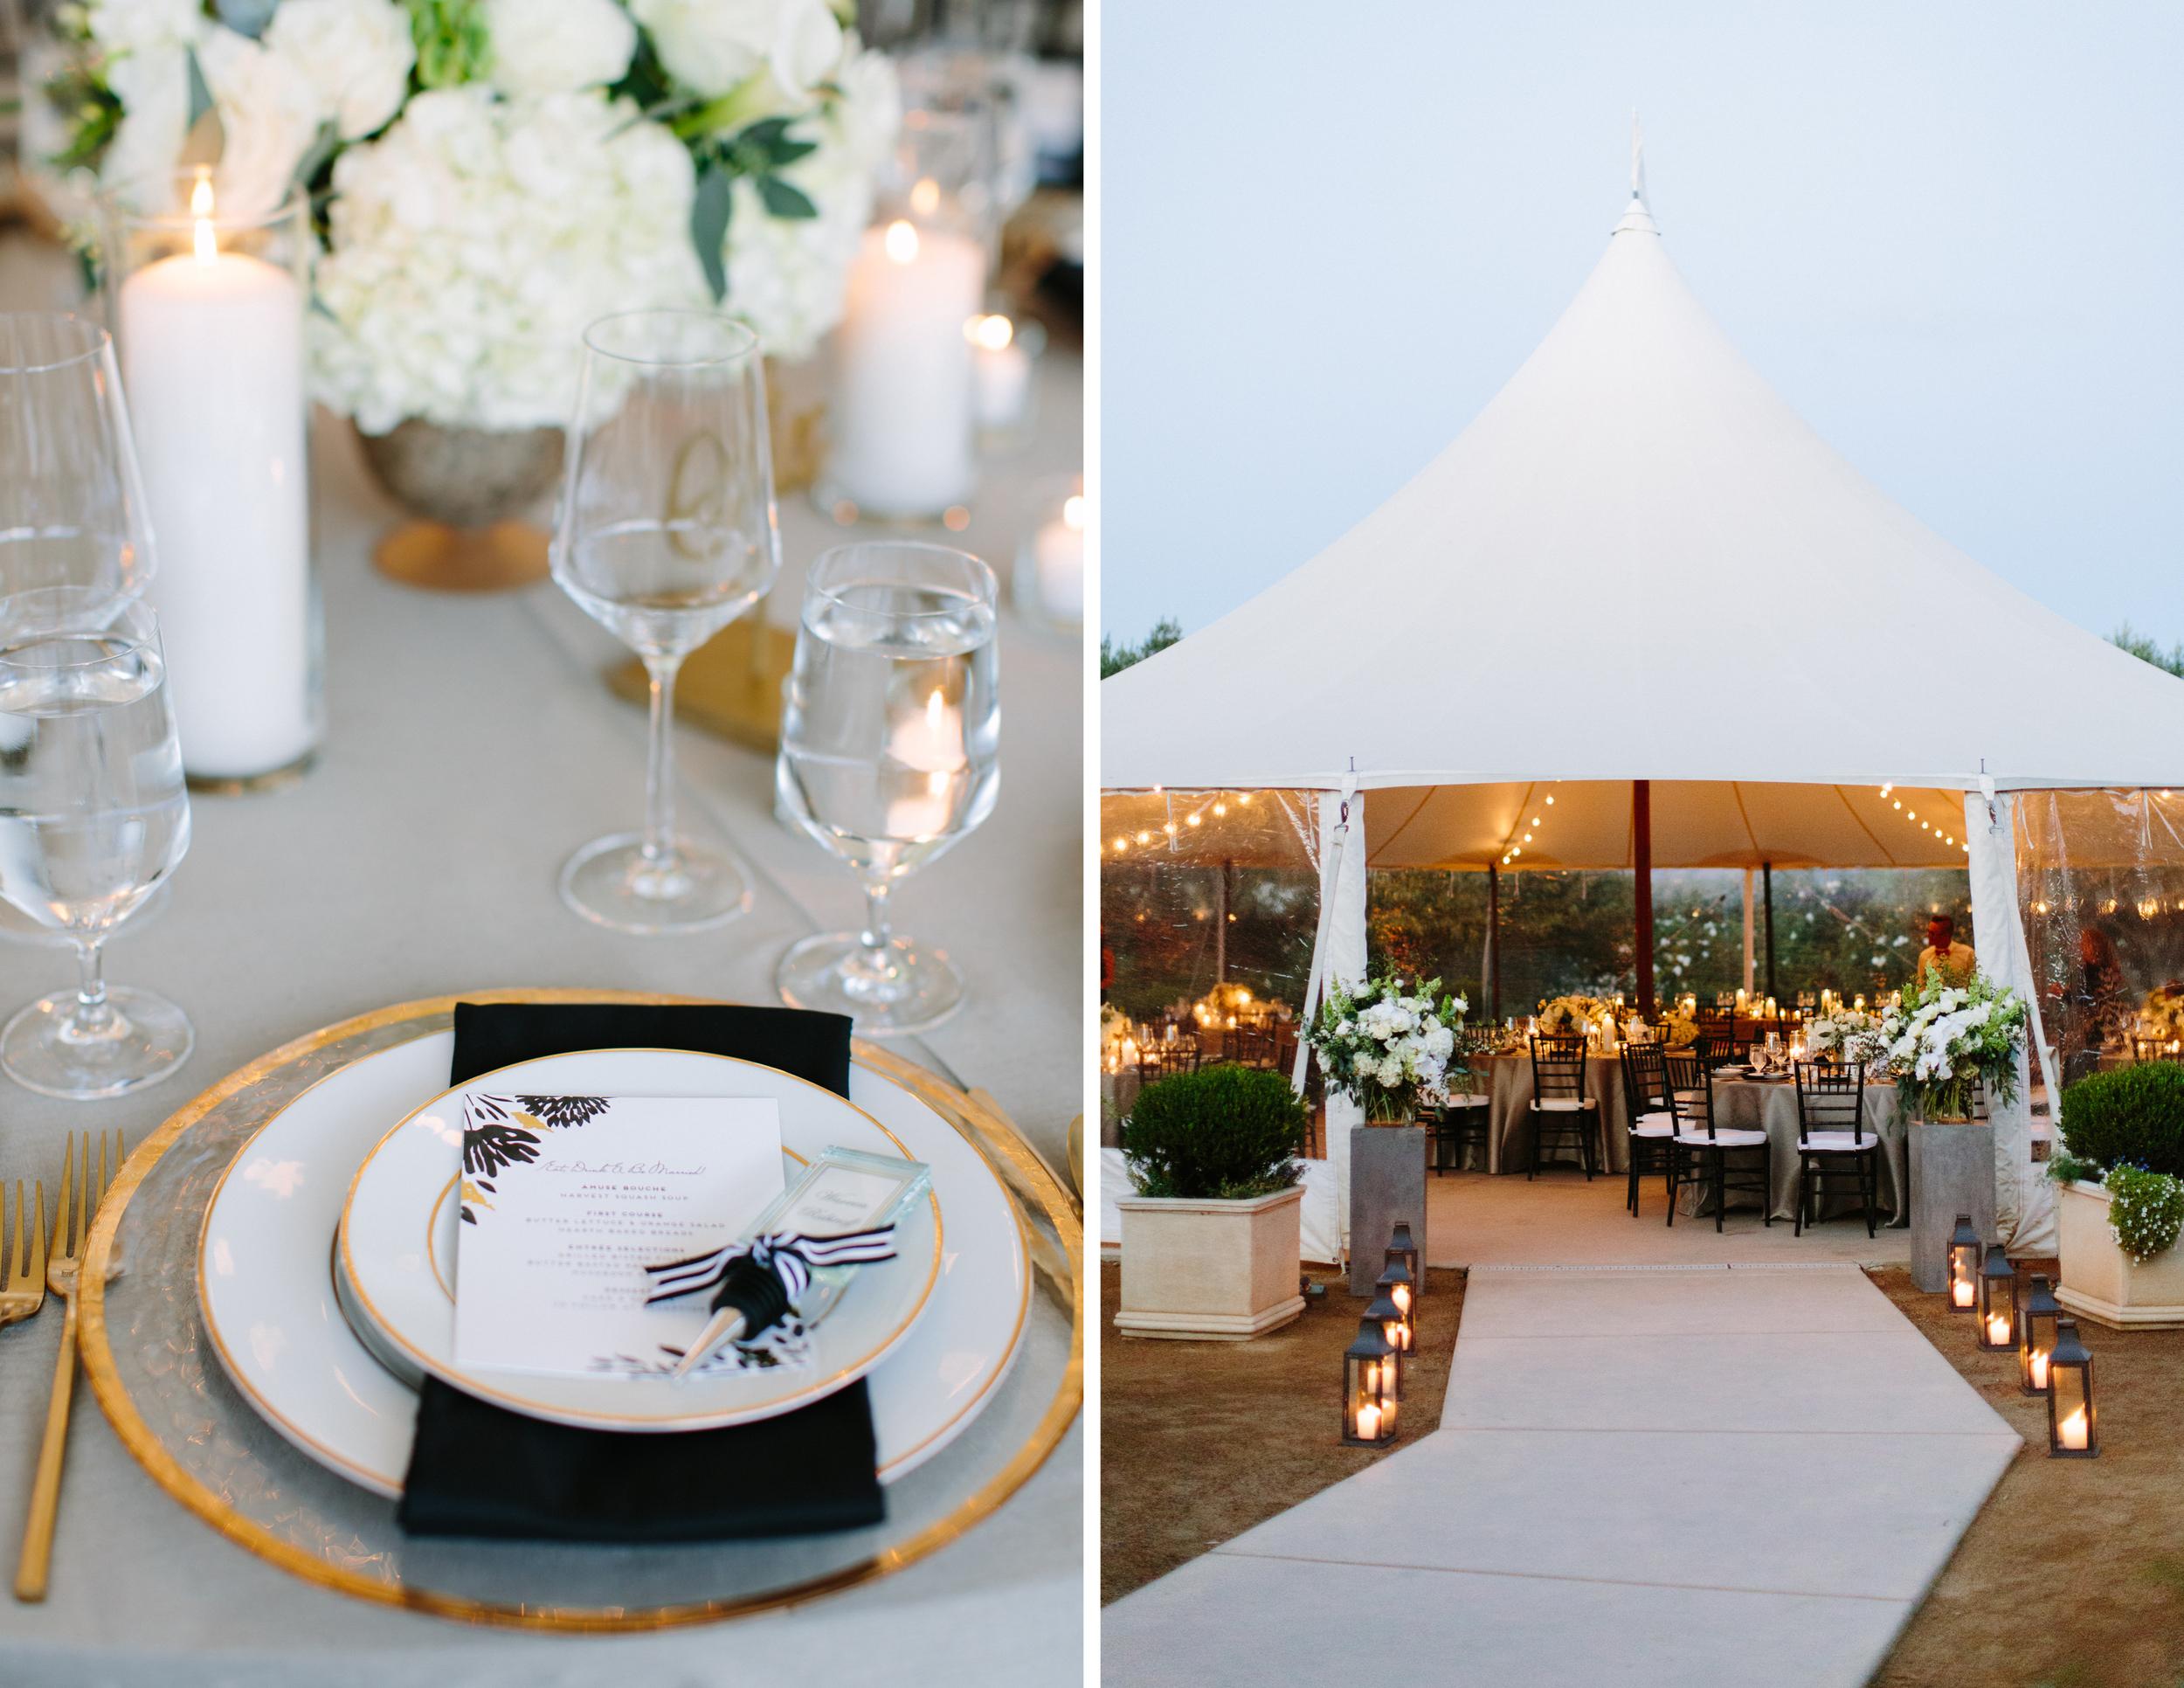 cornerstone sonoma wedding 10.jpg